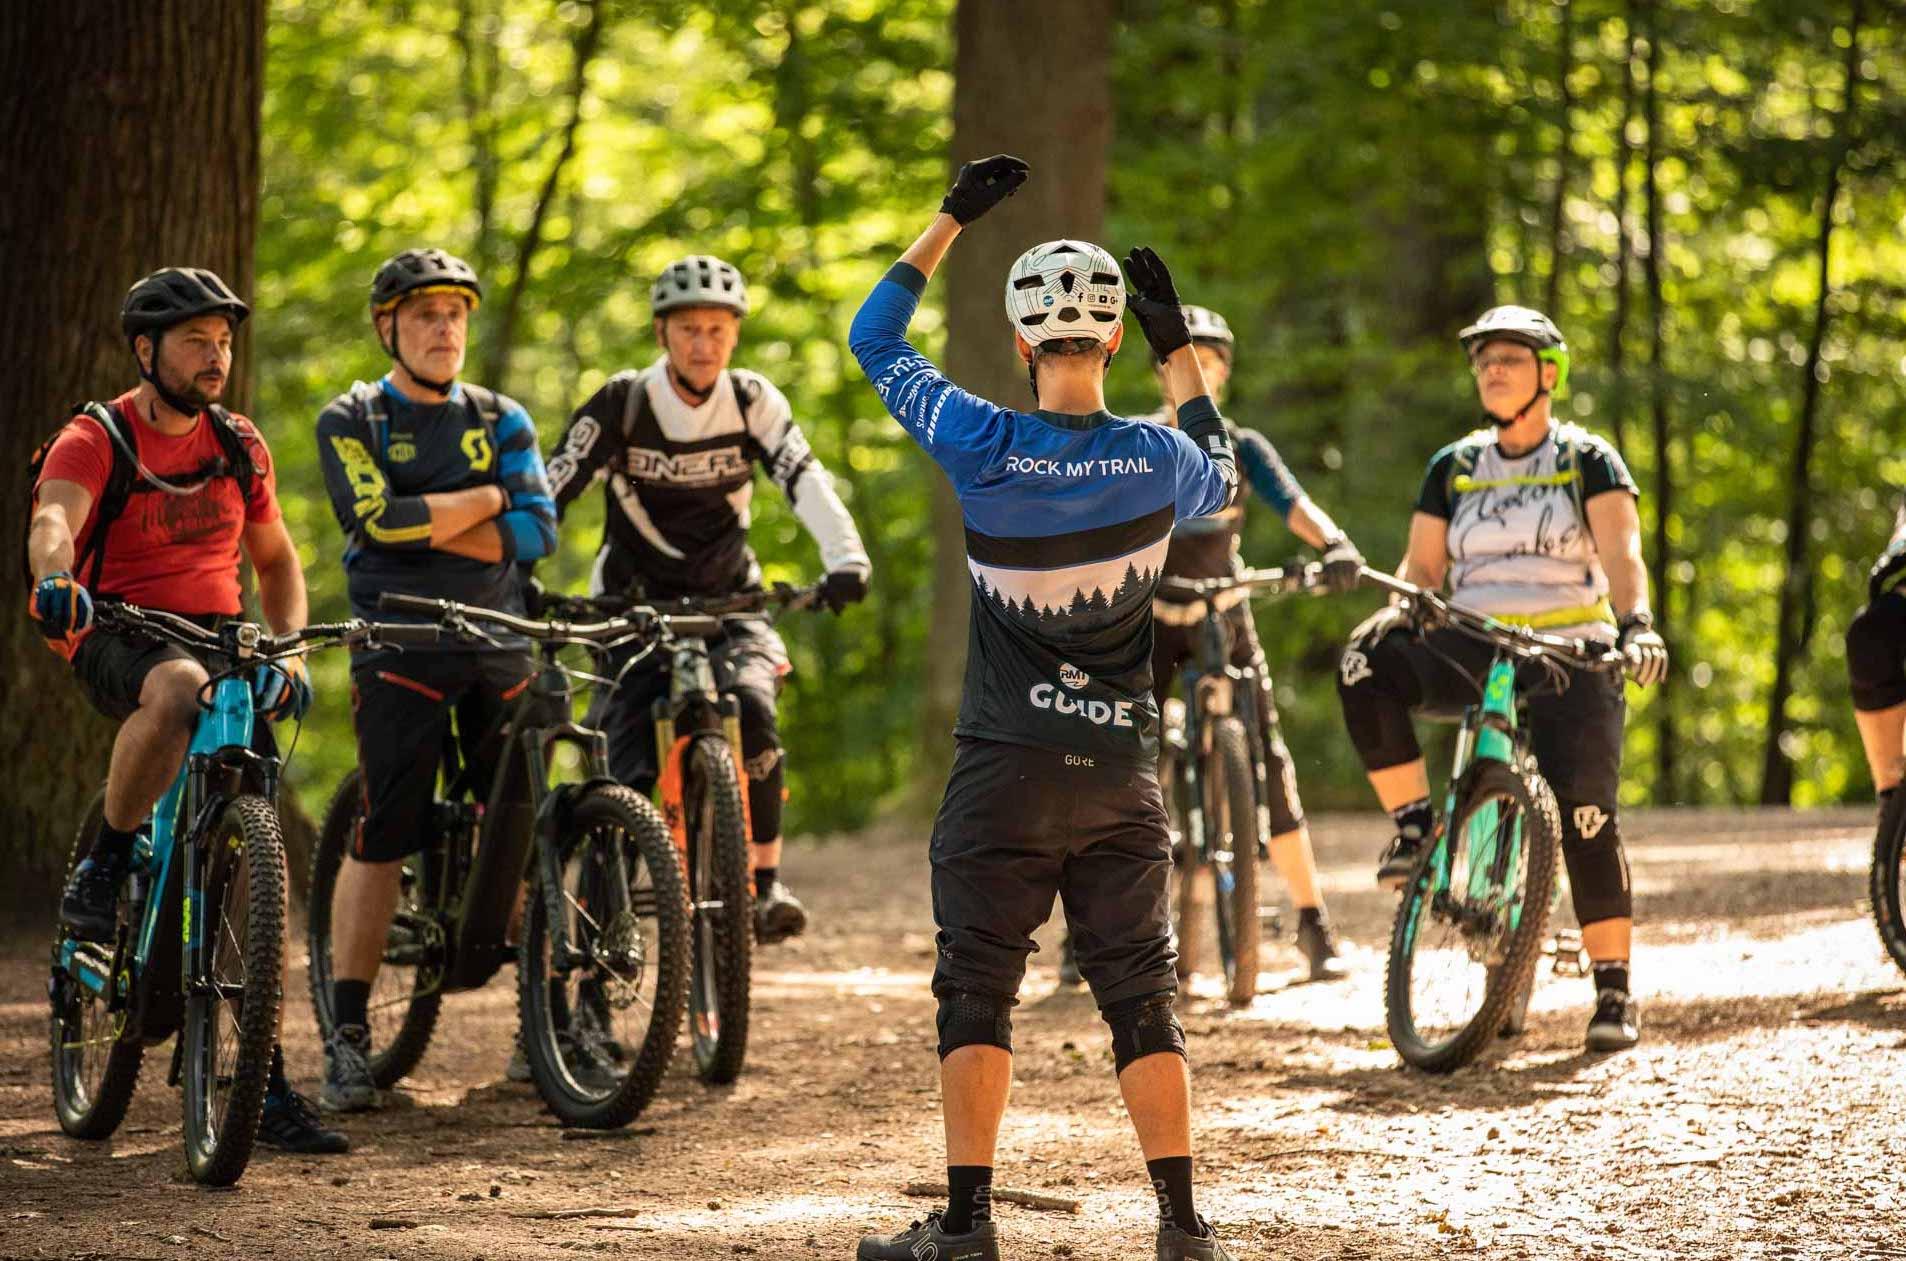 MTB Fahrtechnik Kurse Düsseldorf eBike Training Trails Stadtwald Rock my Trail Bikeschule -1